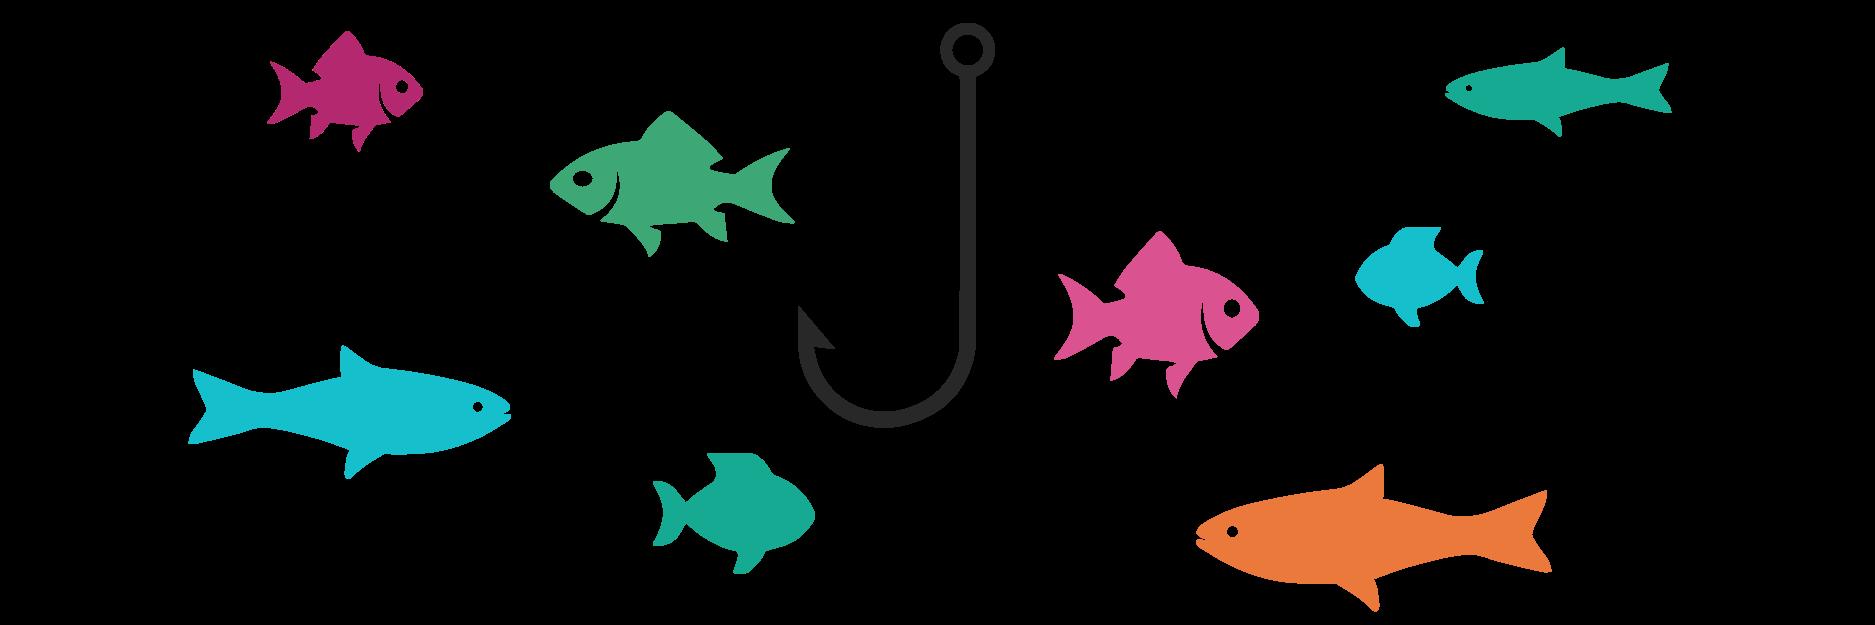 raphicFish-01.png